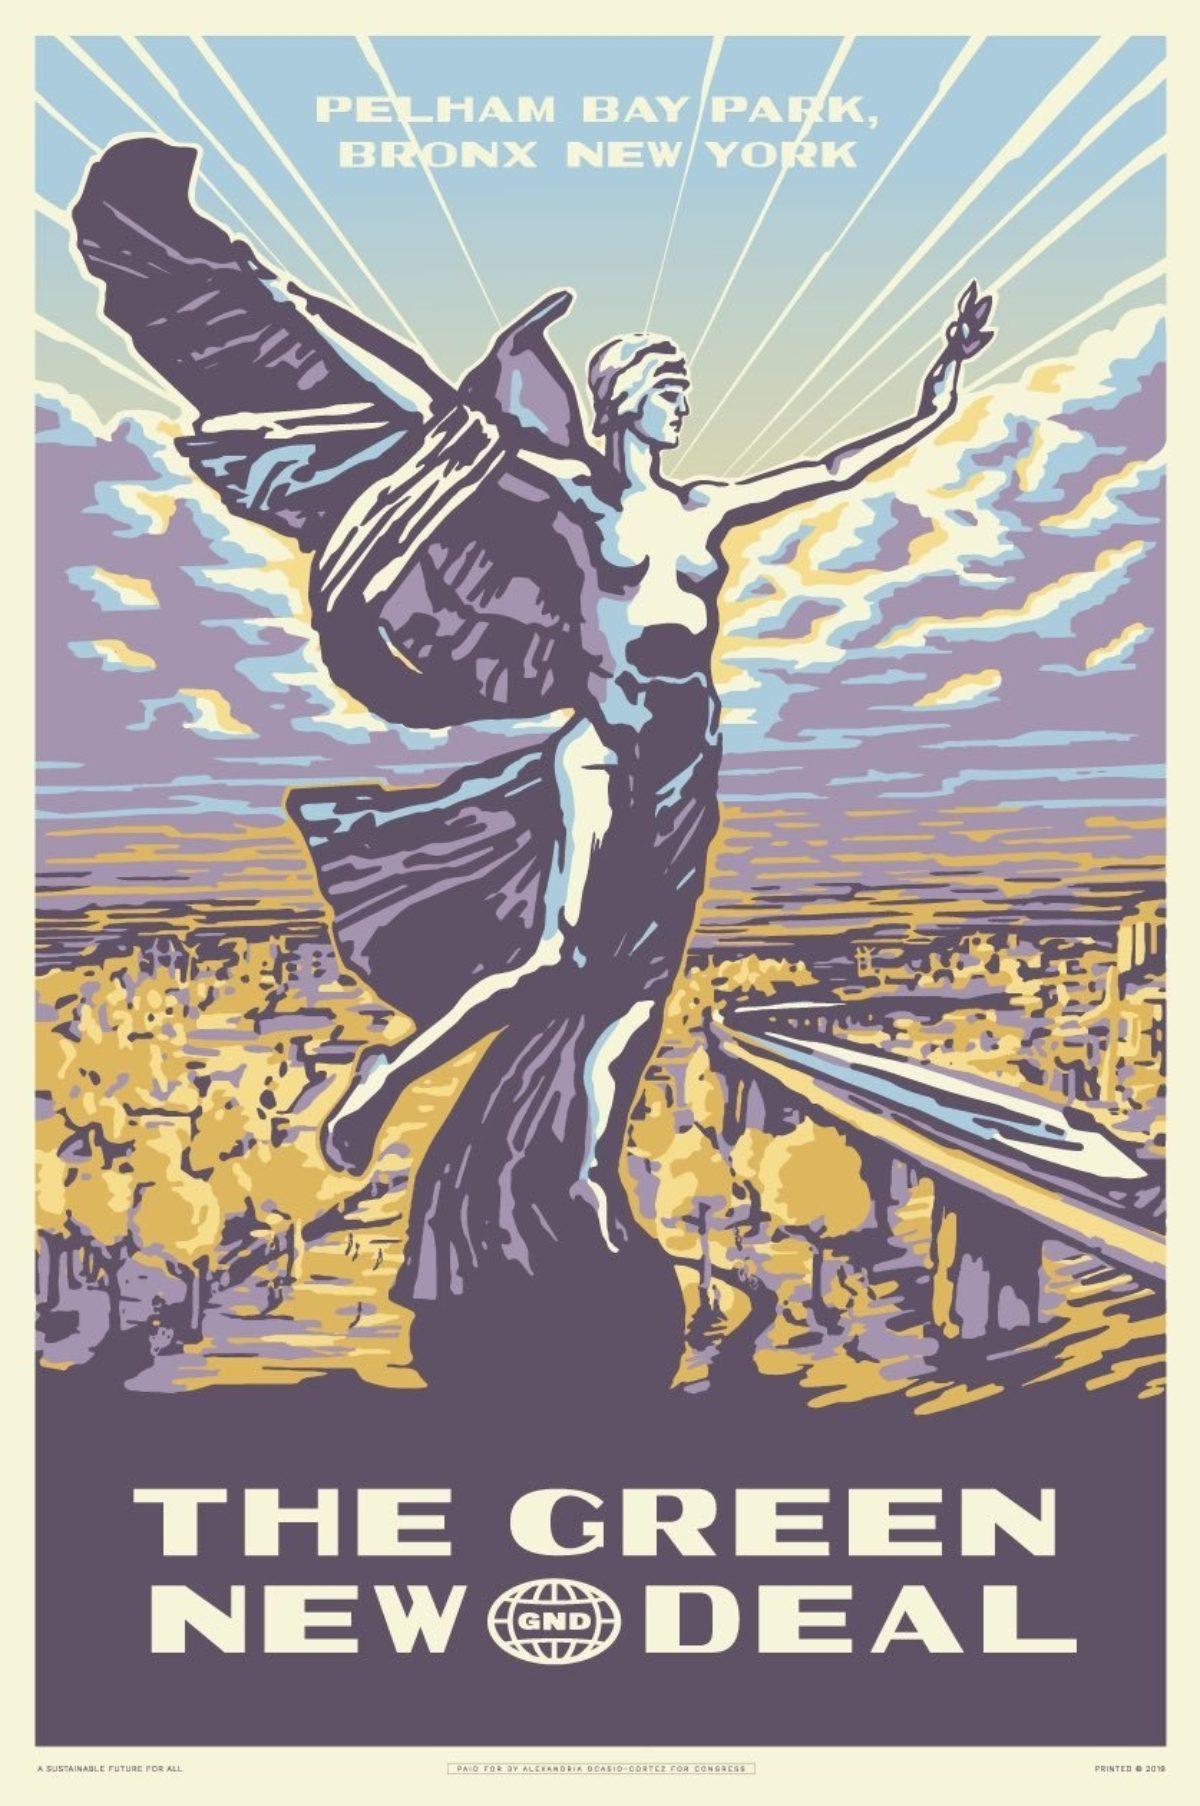 NEW YORK VINTAGE TRAVEL POSTER West Pointl RARE HOT NEW